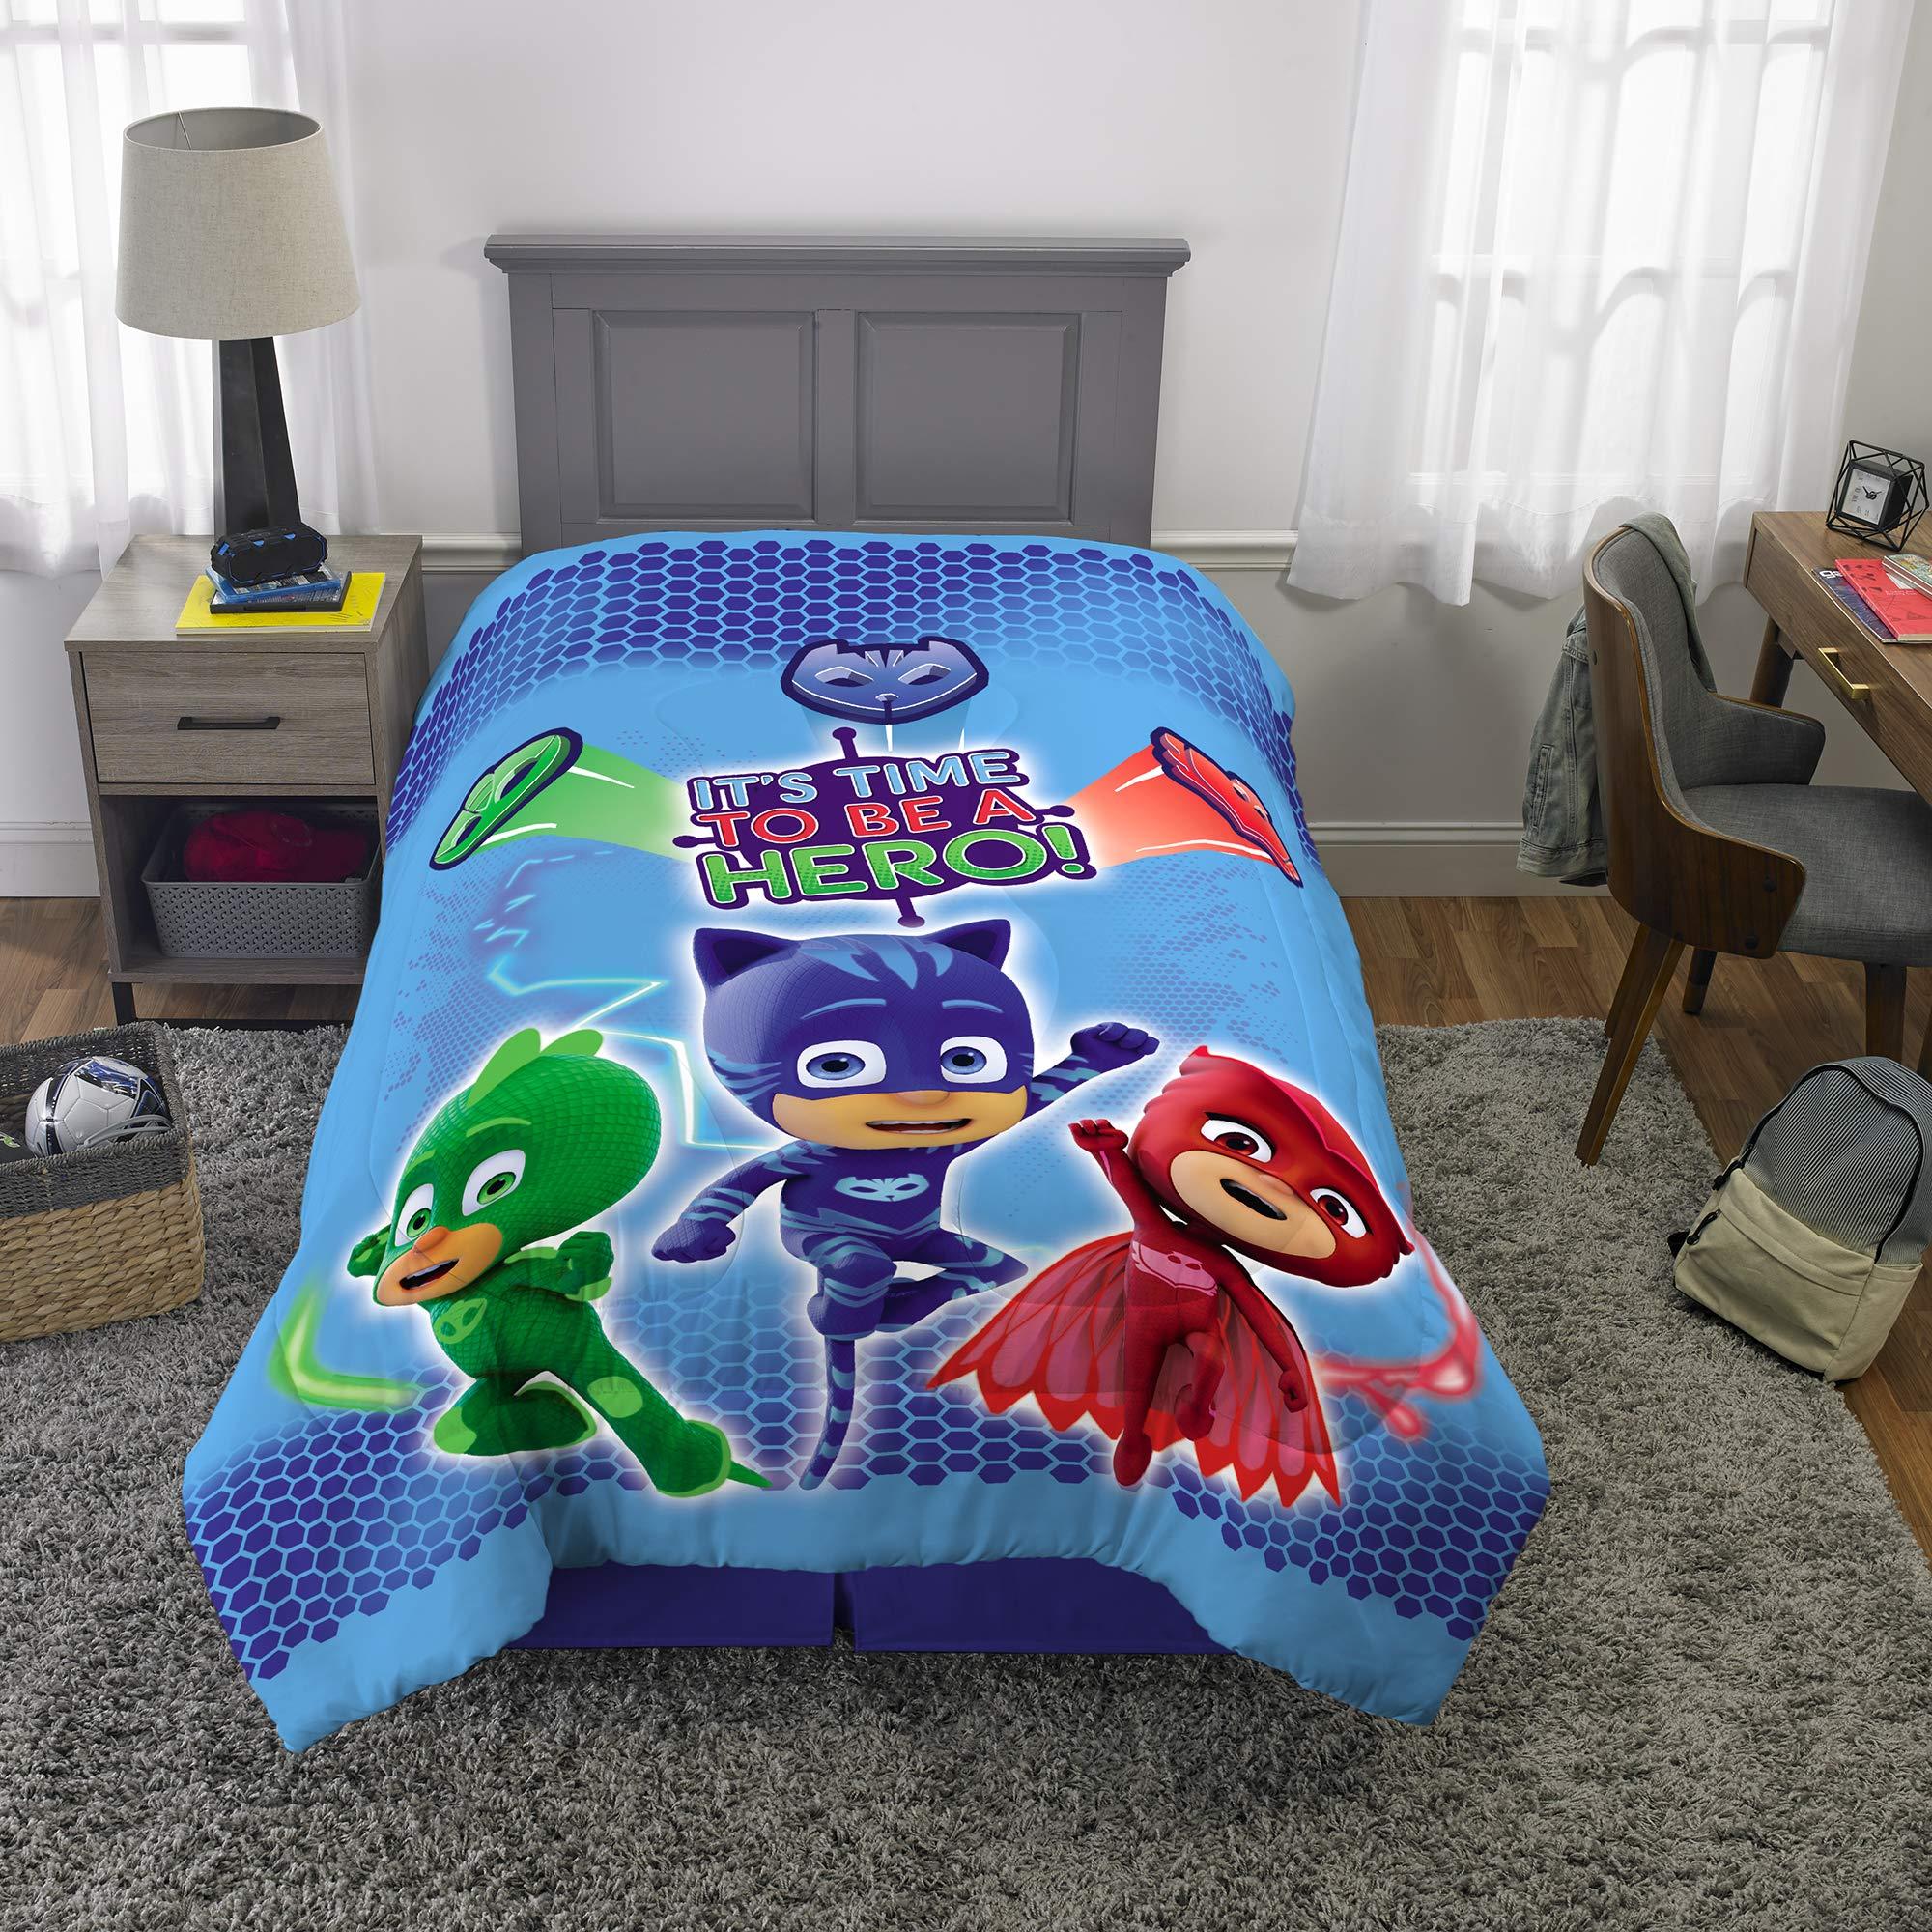 PJ Masks Kids Bedding Super Soft Microfiber Reversible Comforter, Twin/Full 72'' x 86'', Blue